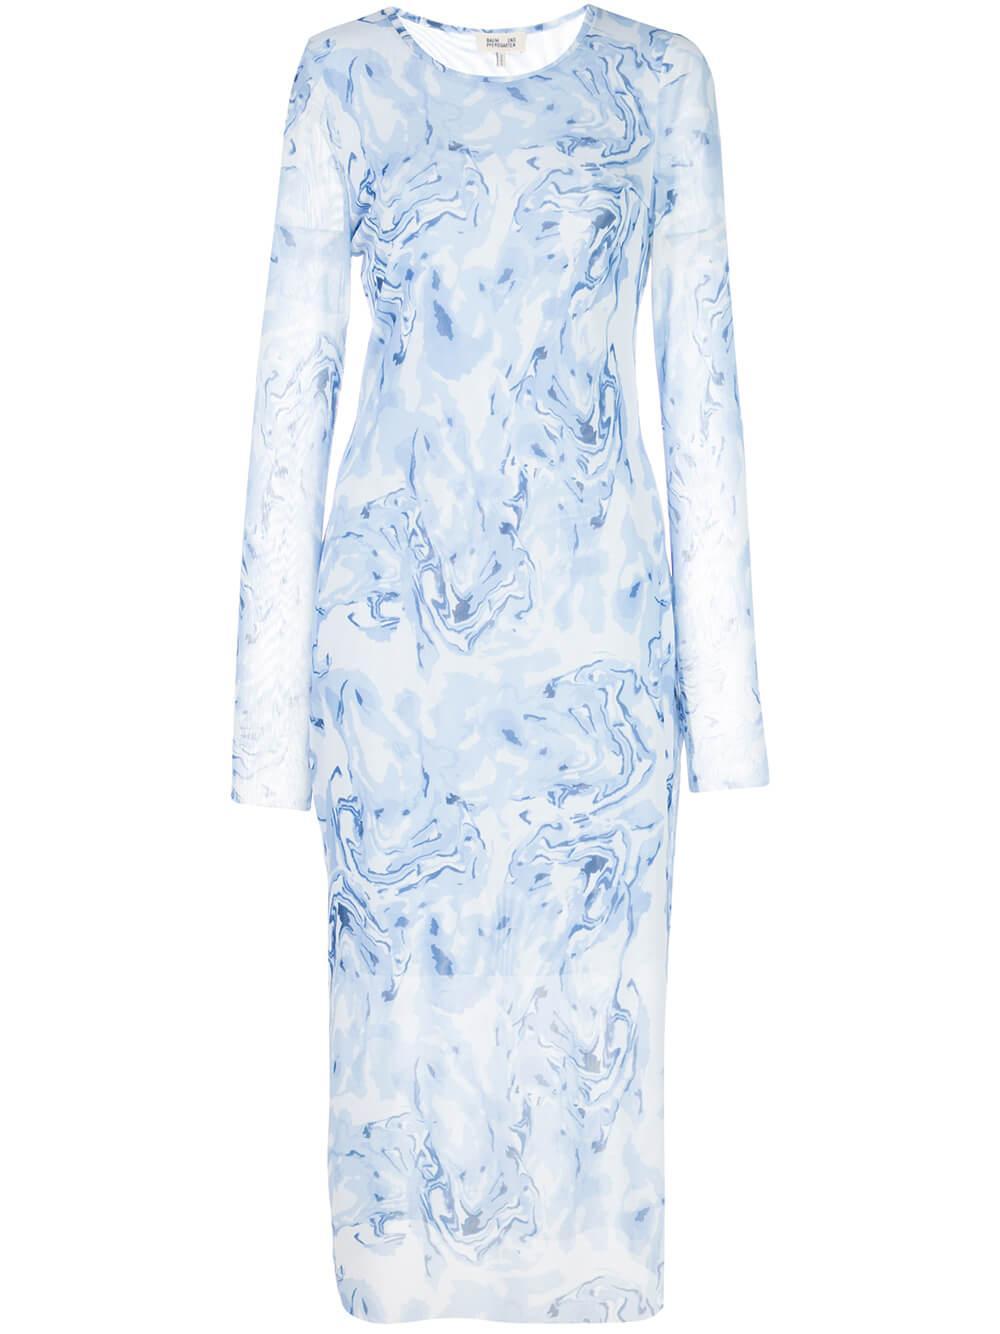 Jolanda Printed Mesh Midi Dress Item # 20829